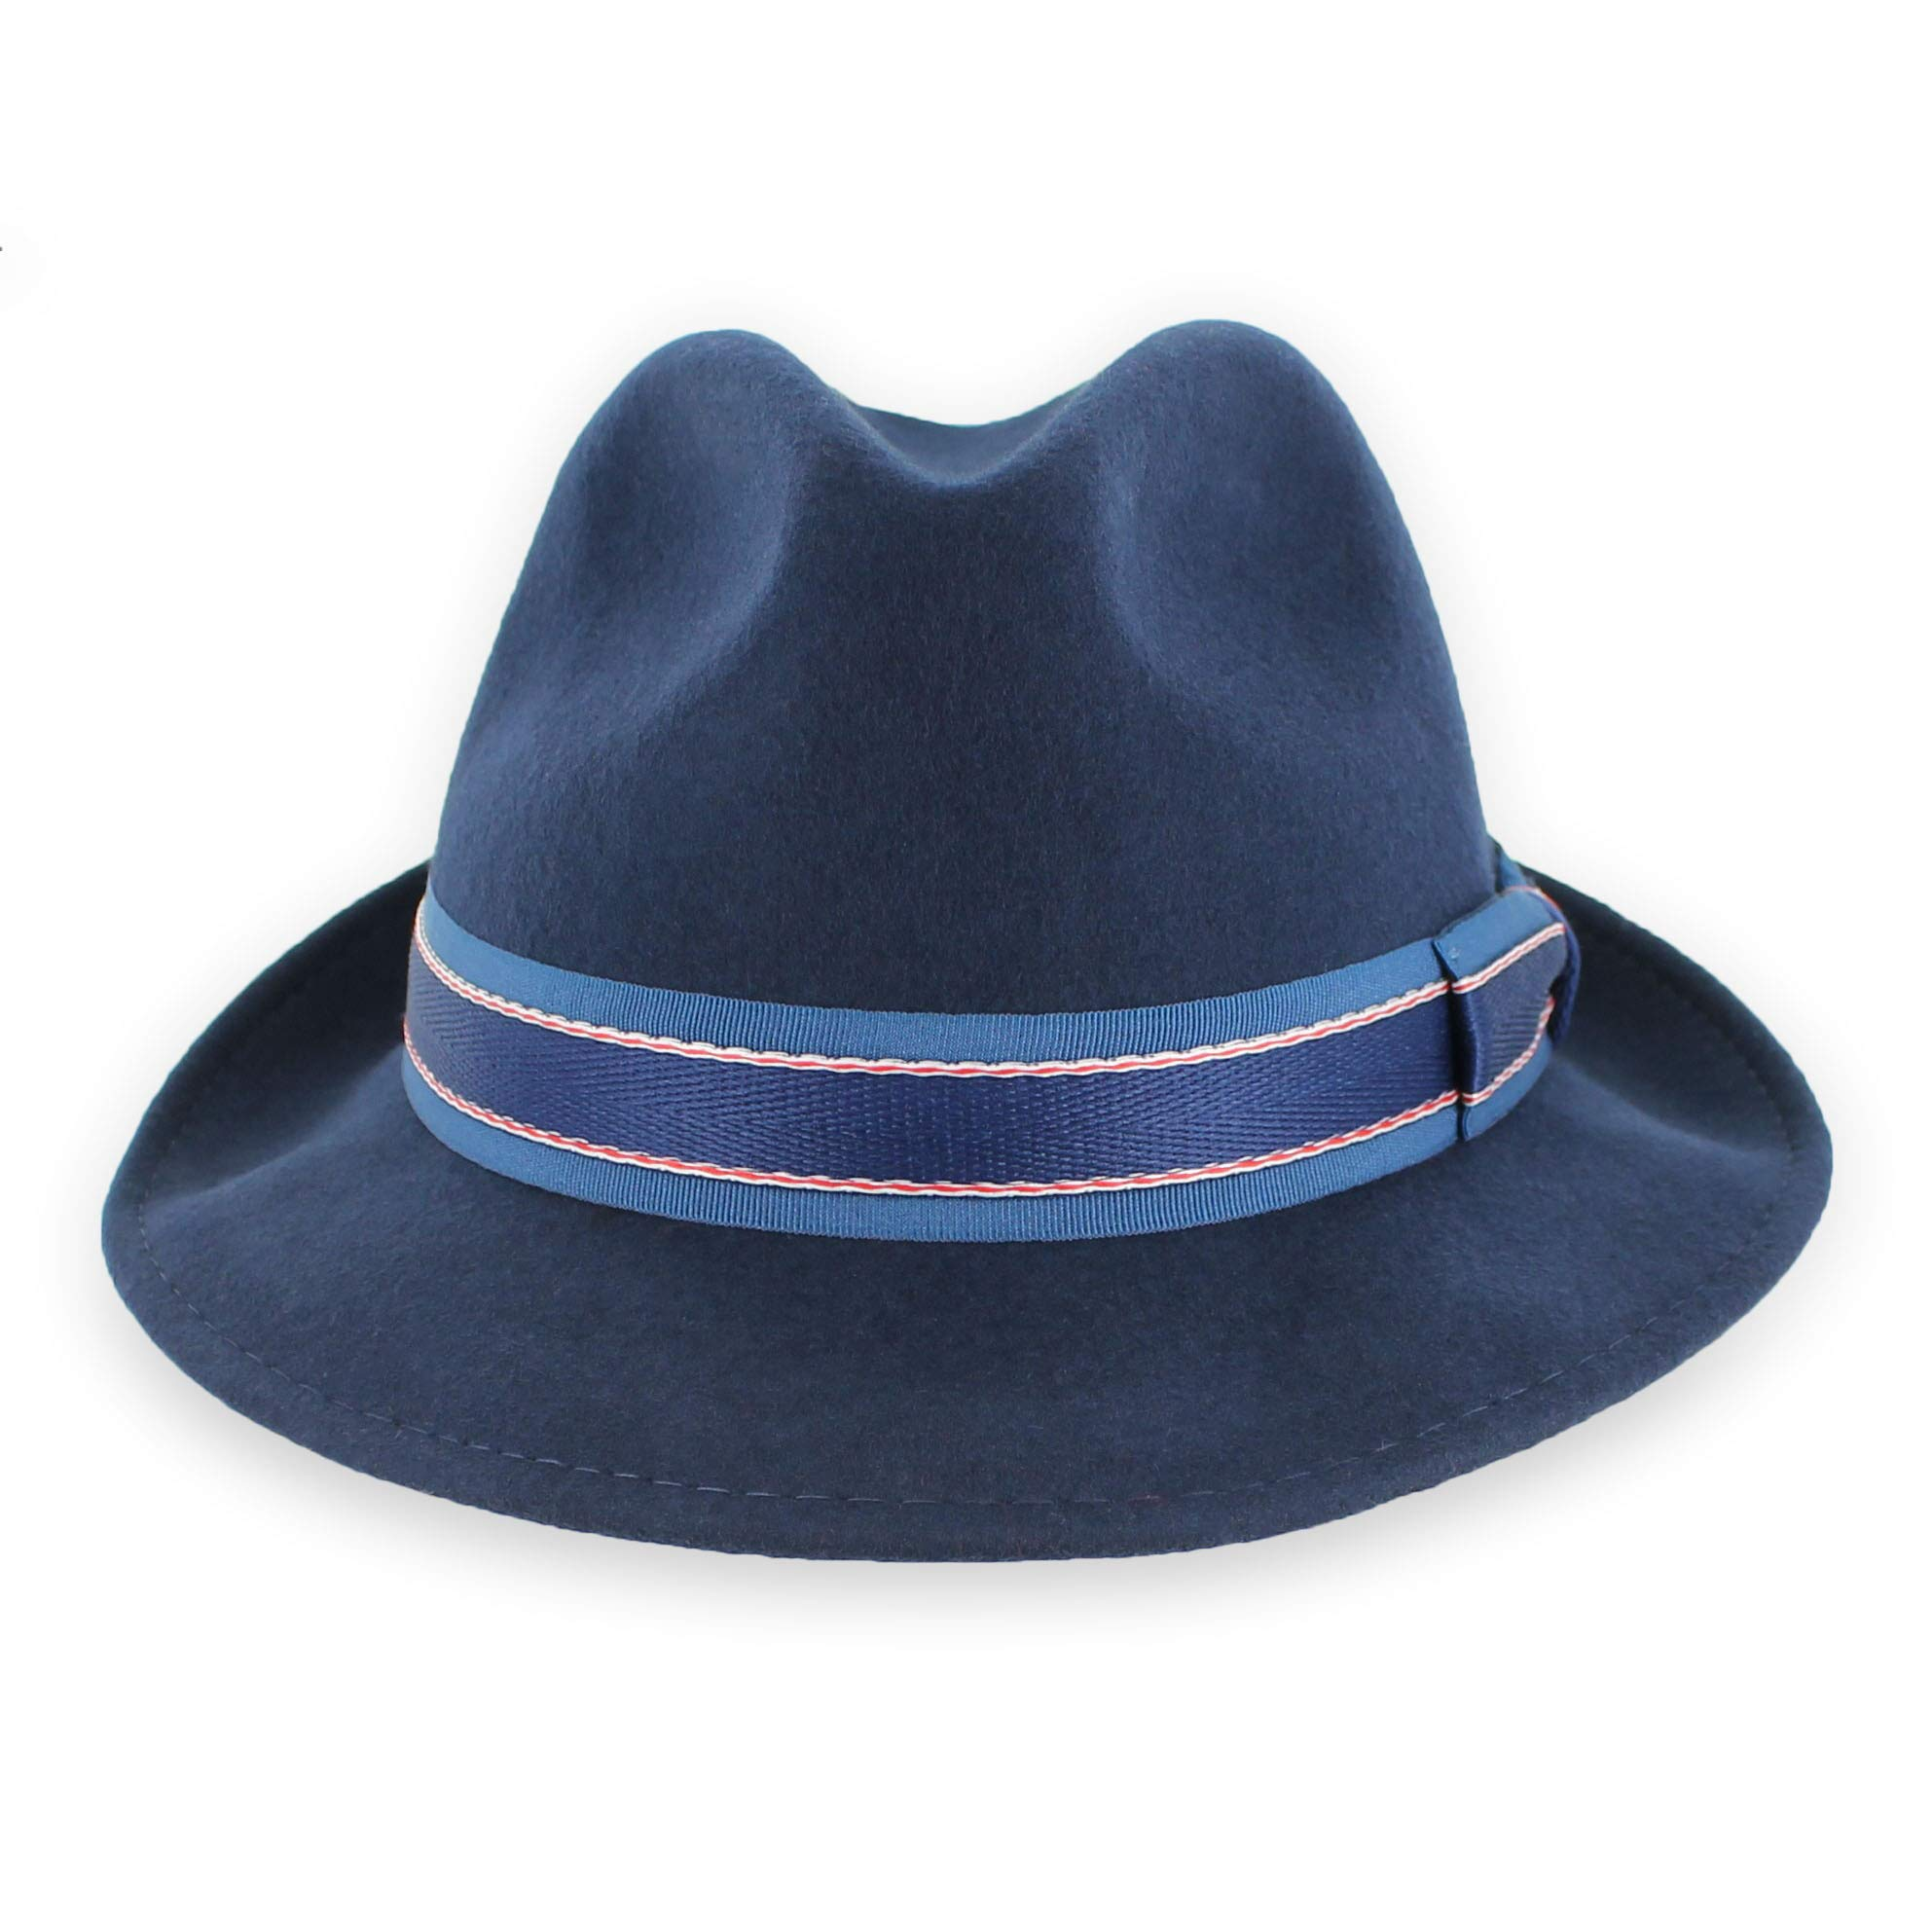 7bbd629ce Belfry Striped Trilby Men Women Crushable Wool Felt Fedora Hat (Medium) Navy